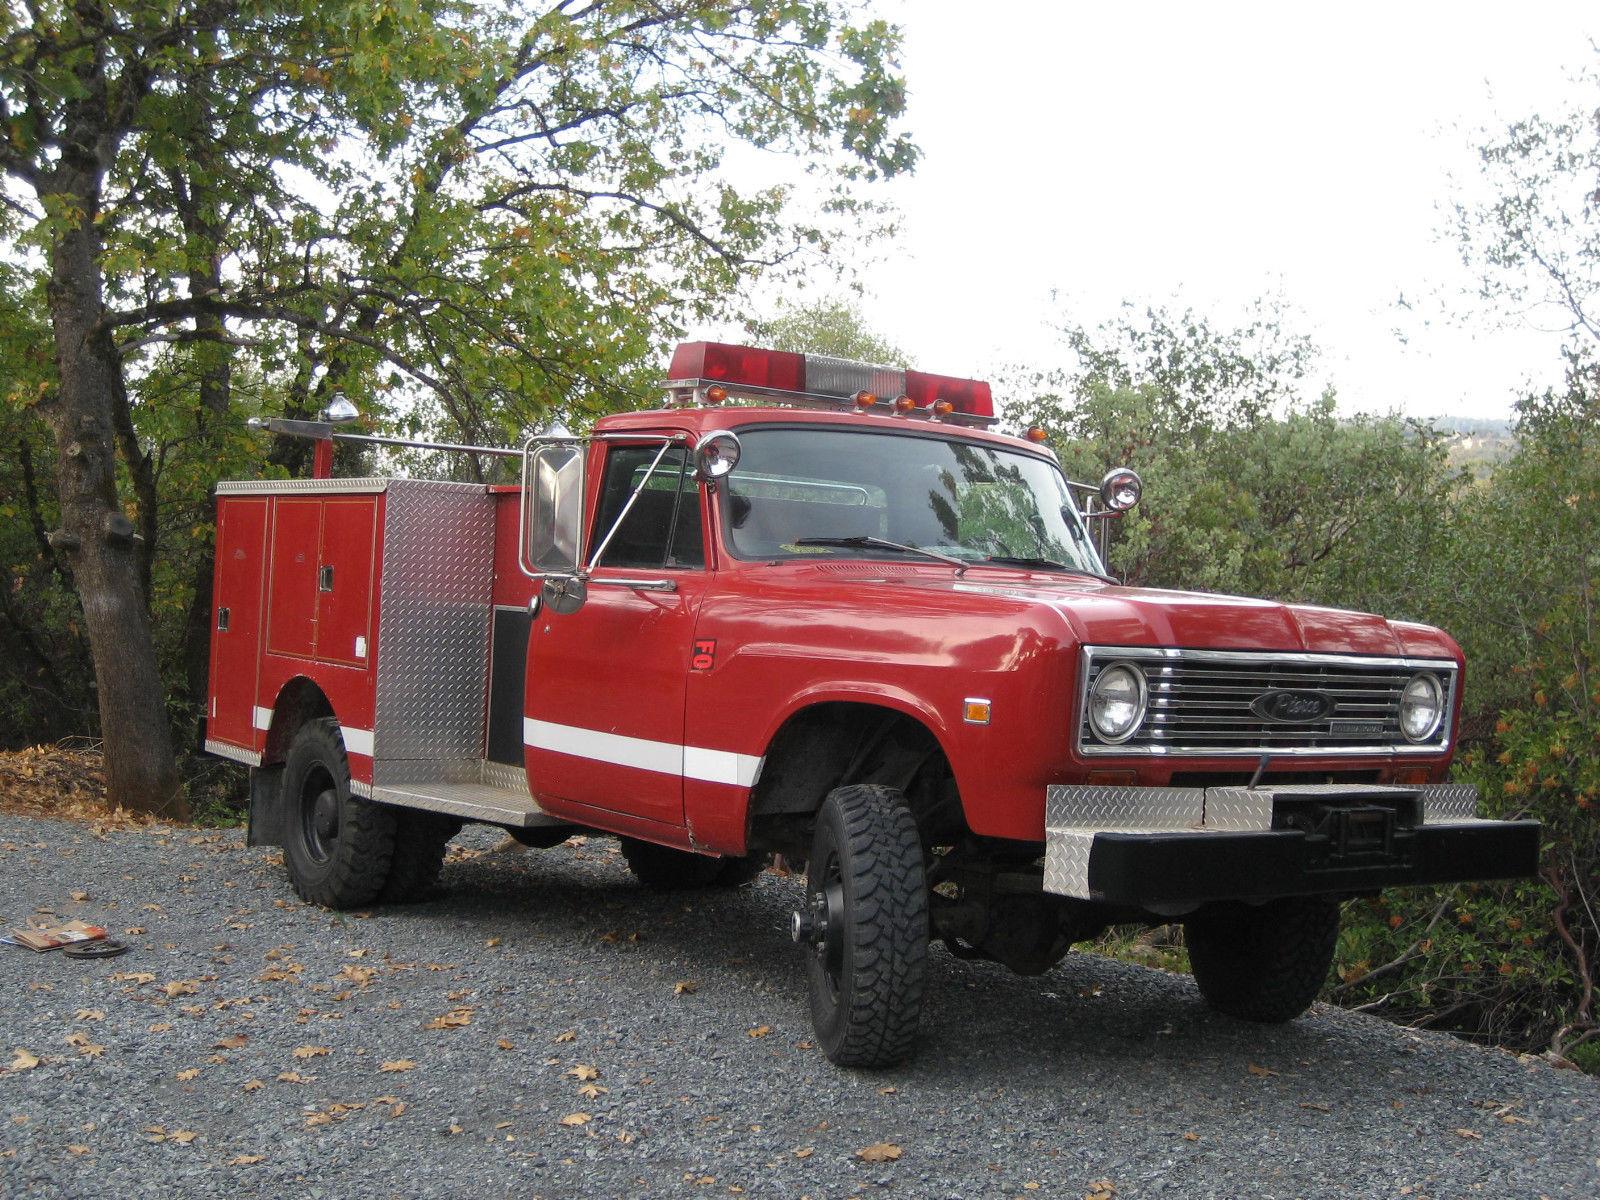 1975 International Harvester IH 200 Pickup - Heavy Duty 1